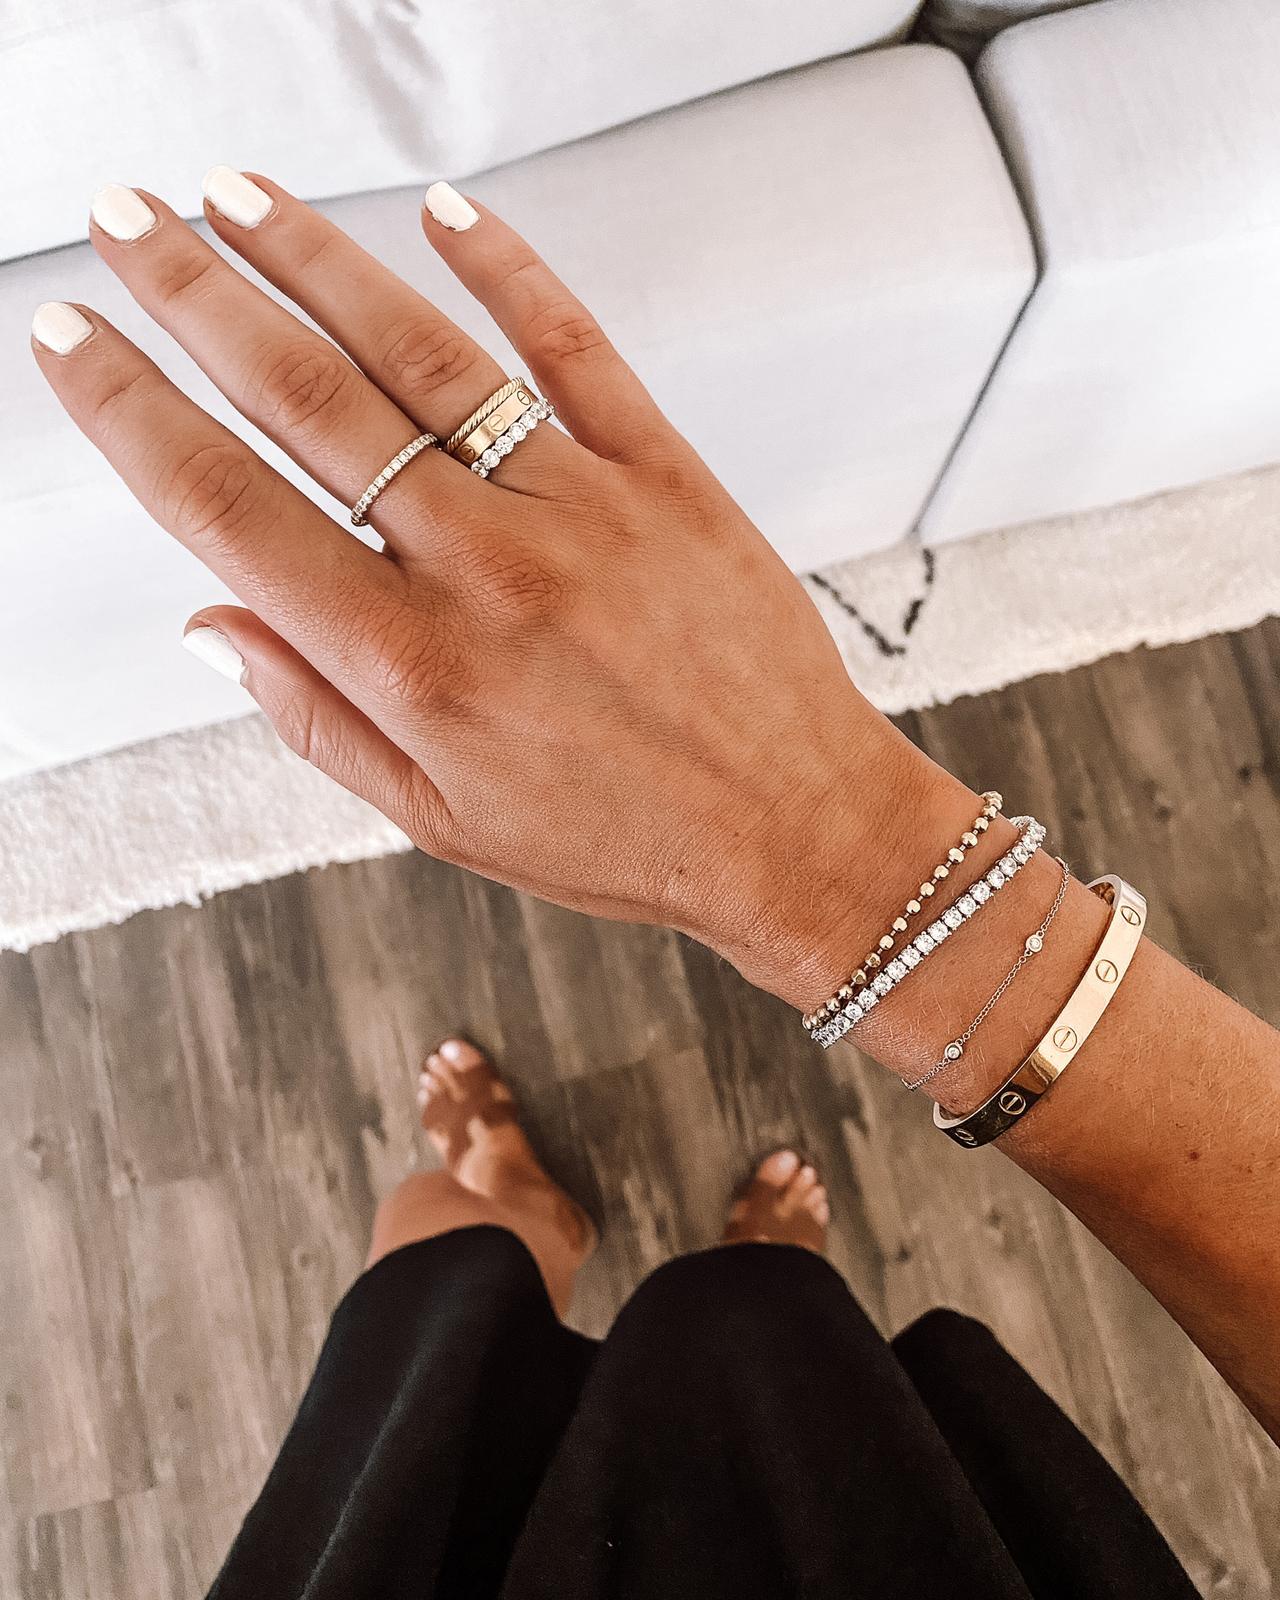 Fashion Jackson Wearing Amazon Fashion Jewelry CZ Diamond Tennis Bracelet